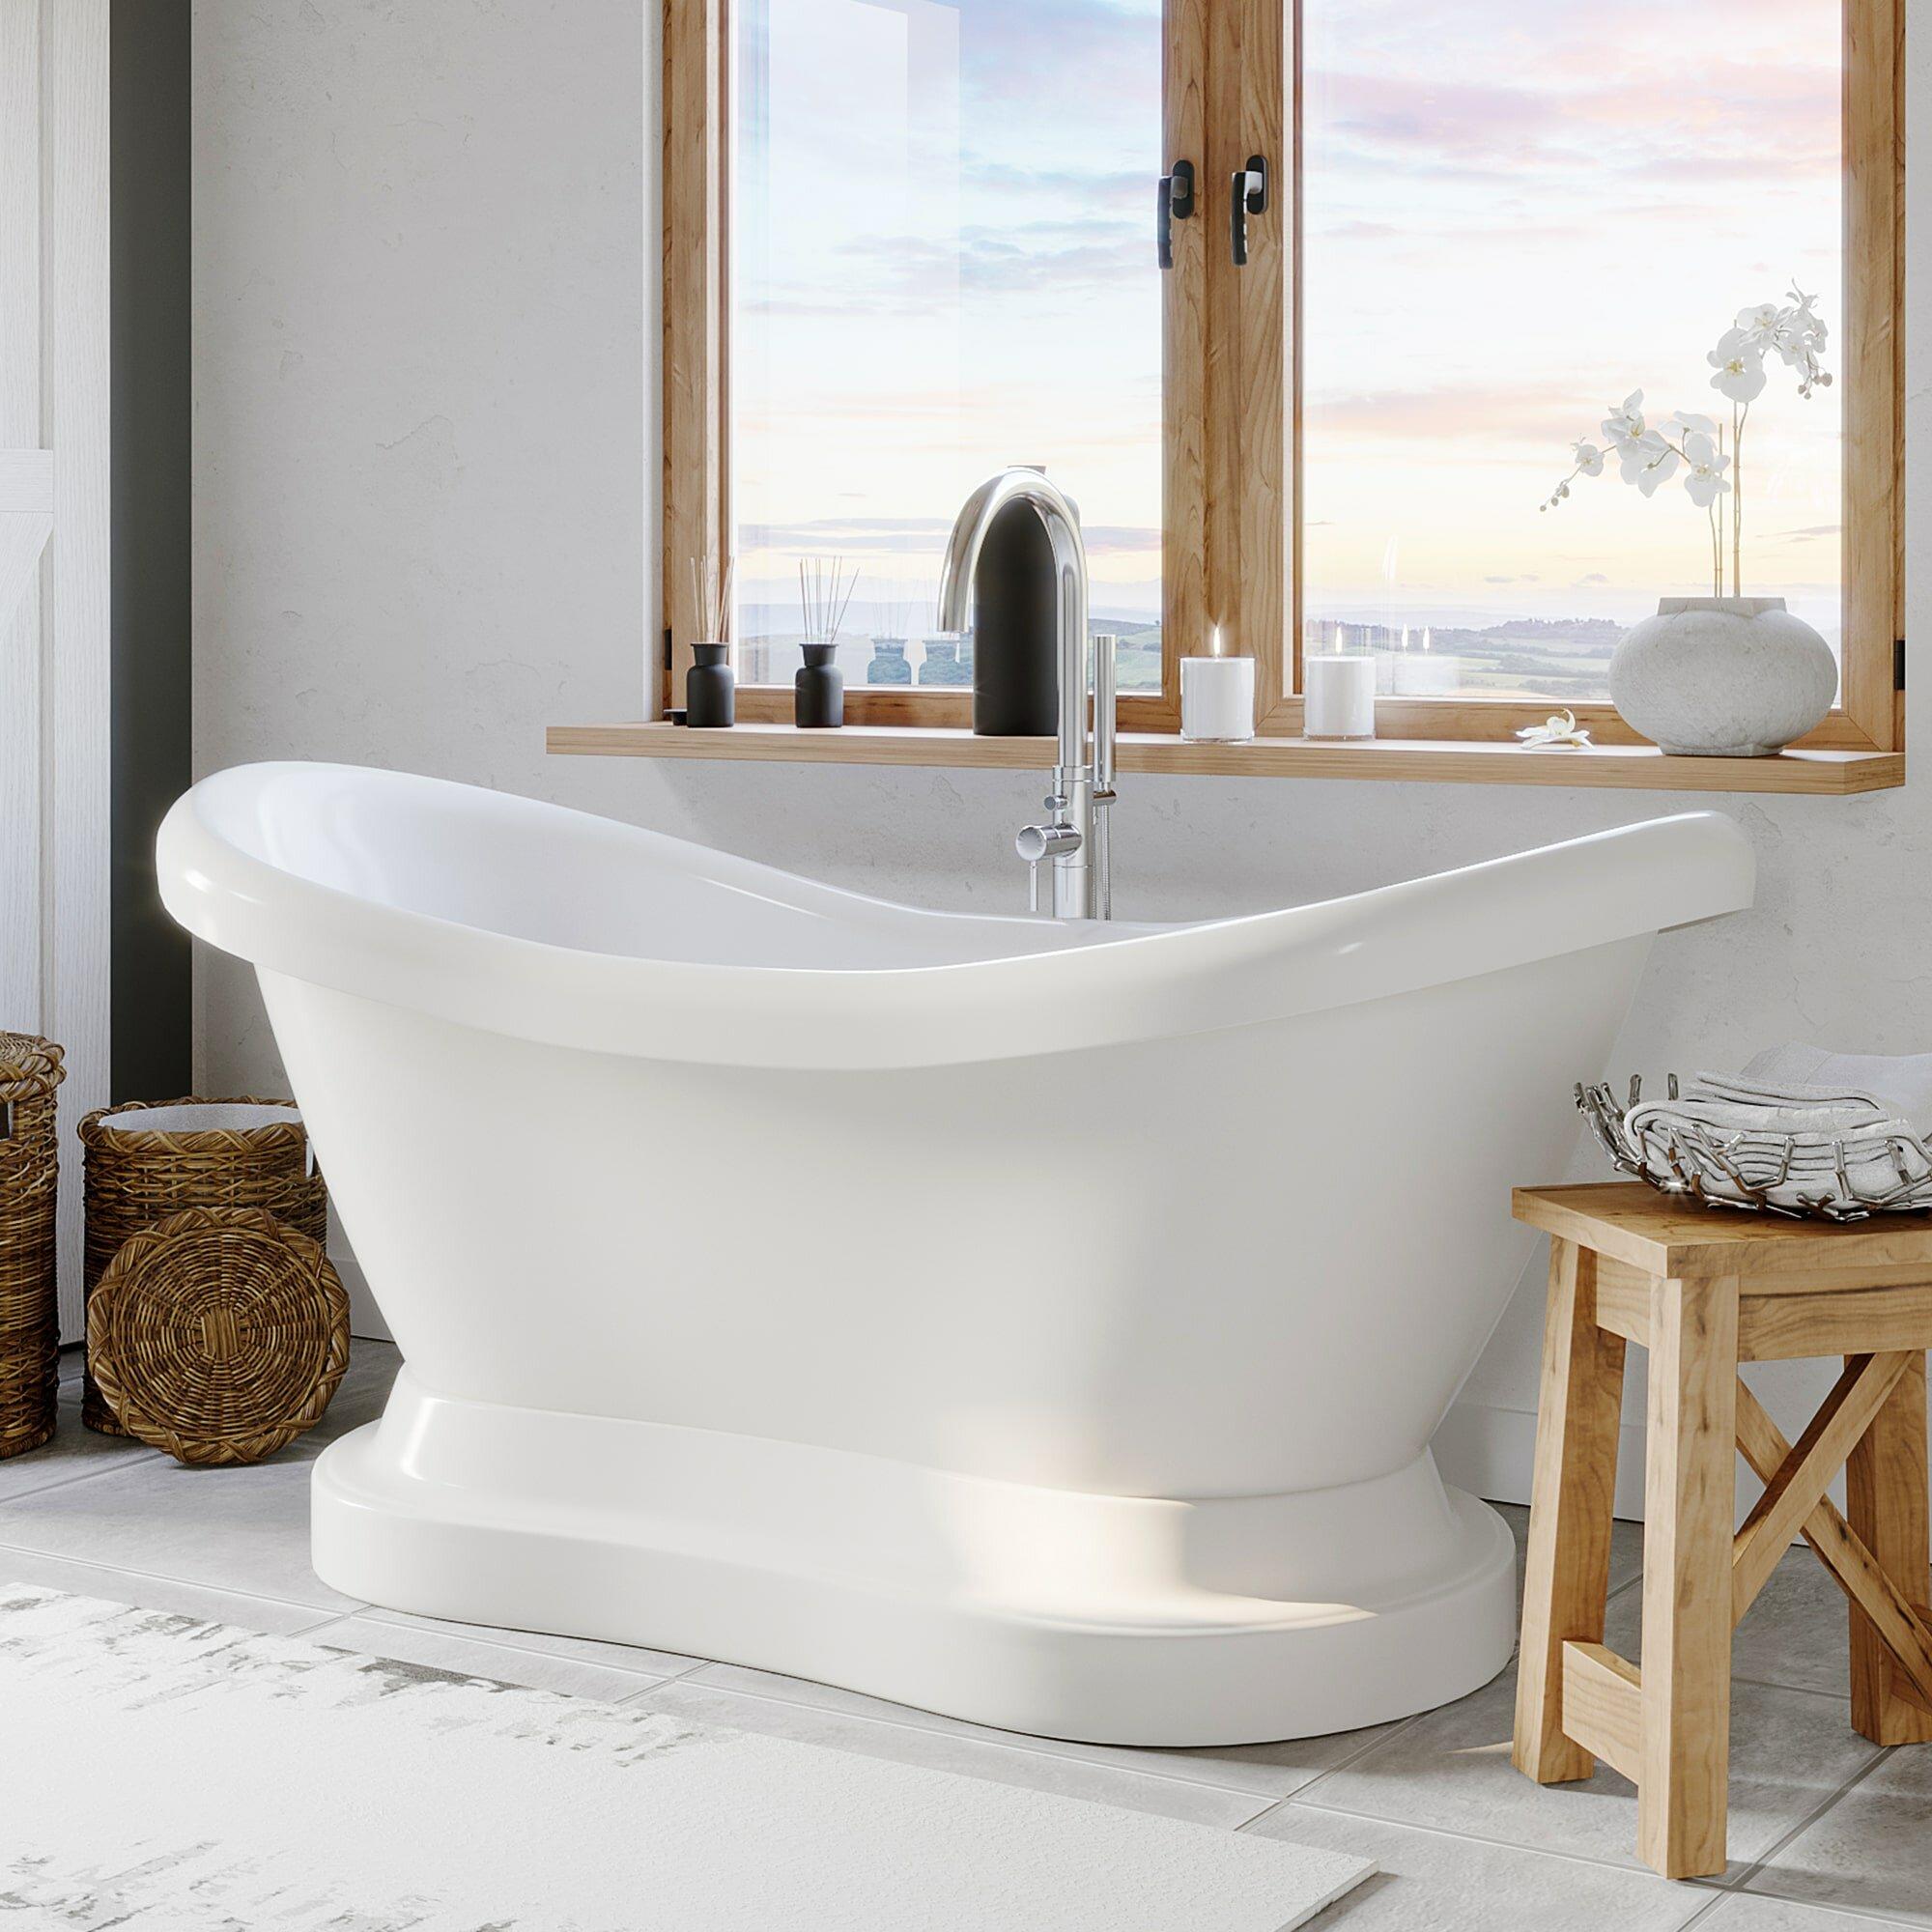 Picture of: Cambridge Plumbing 69 X 29 Pedestal Soaking Bathtub Wayfair